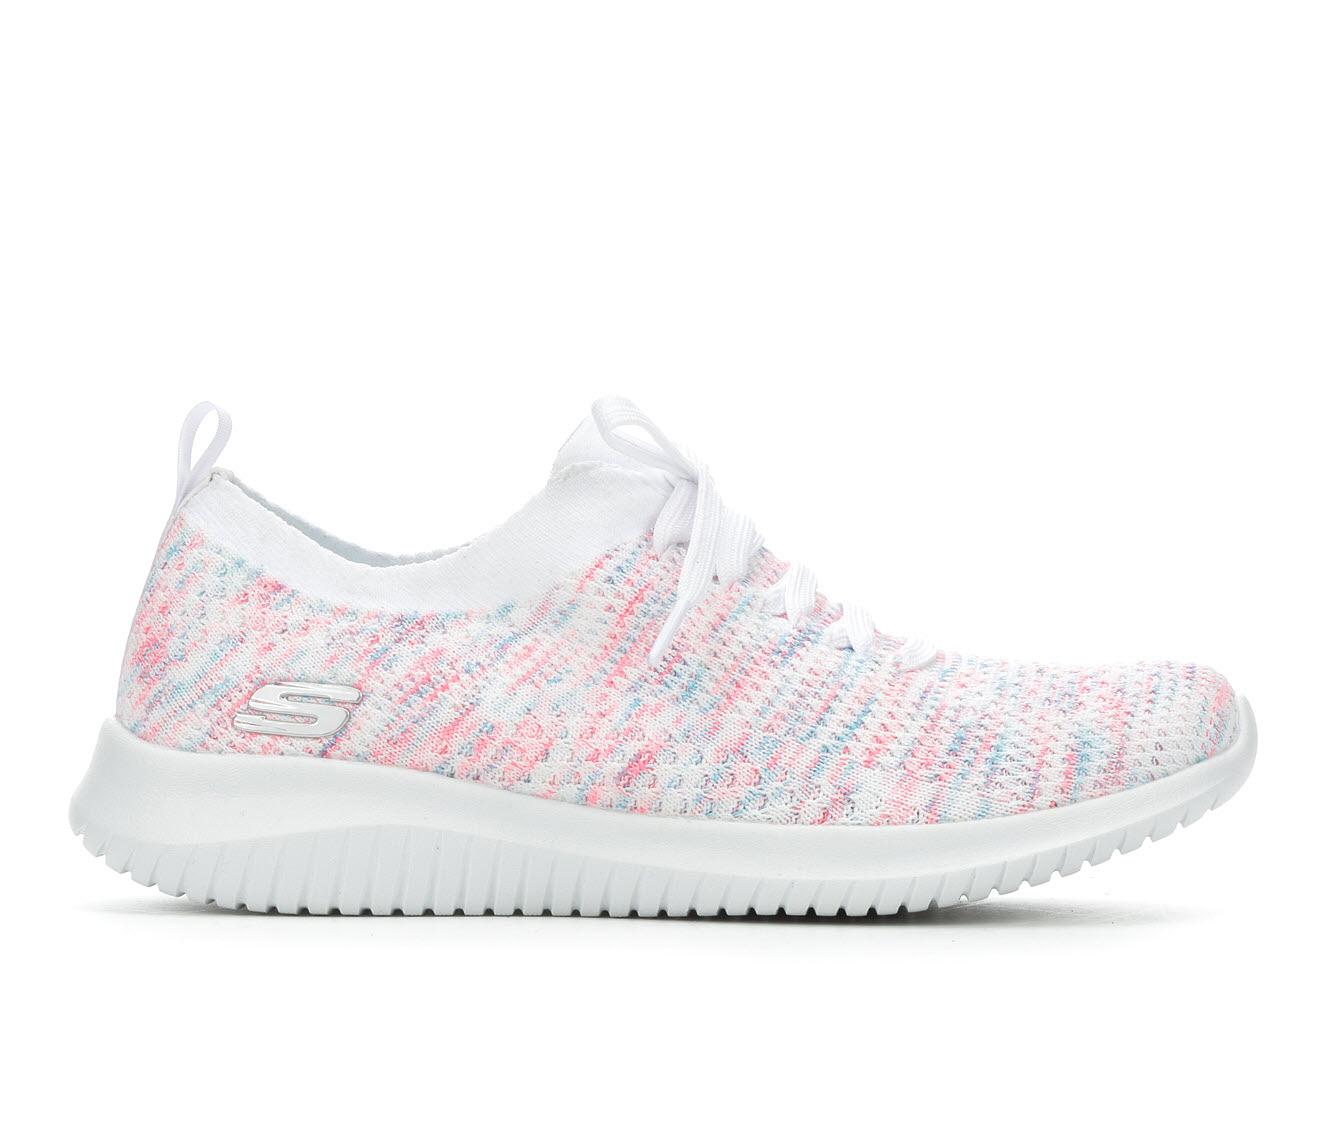 Skechers Happy Days 13101 Women's Athletic Shoe (White)